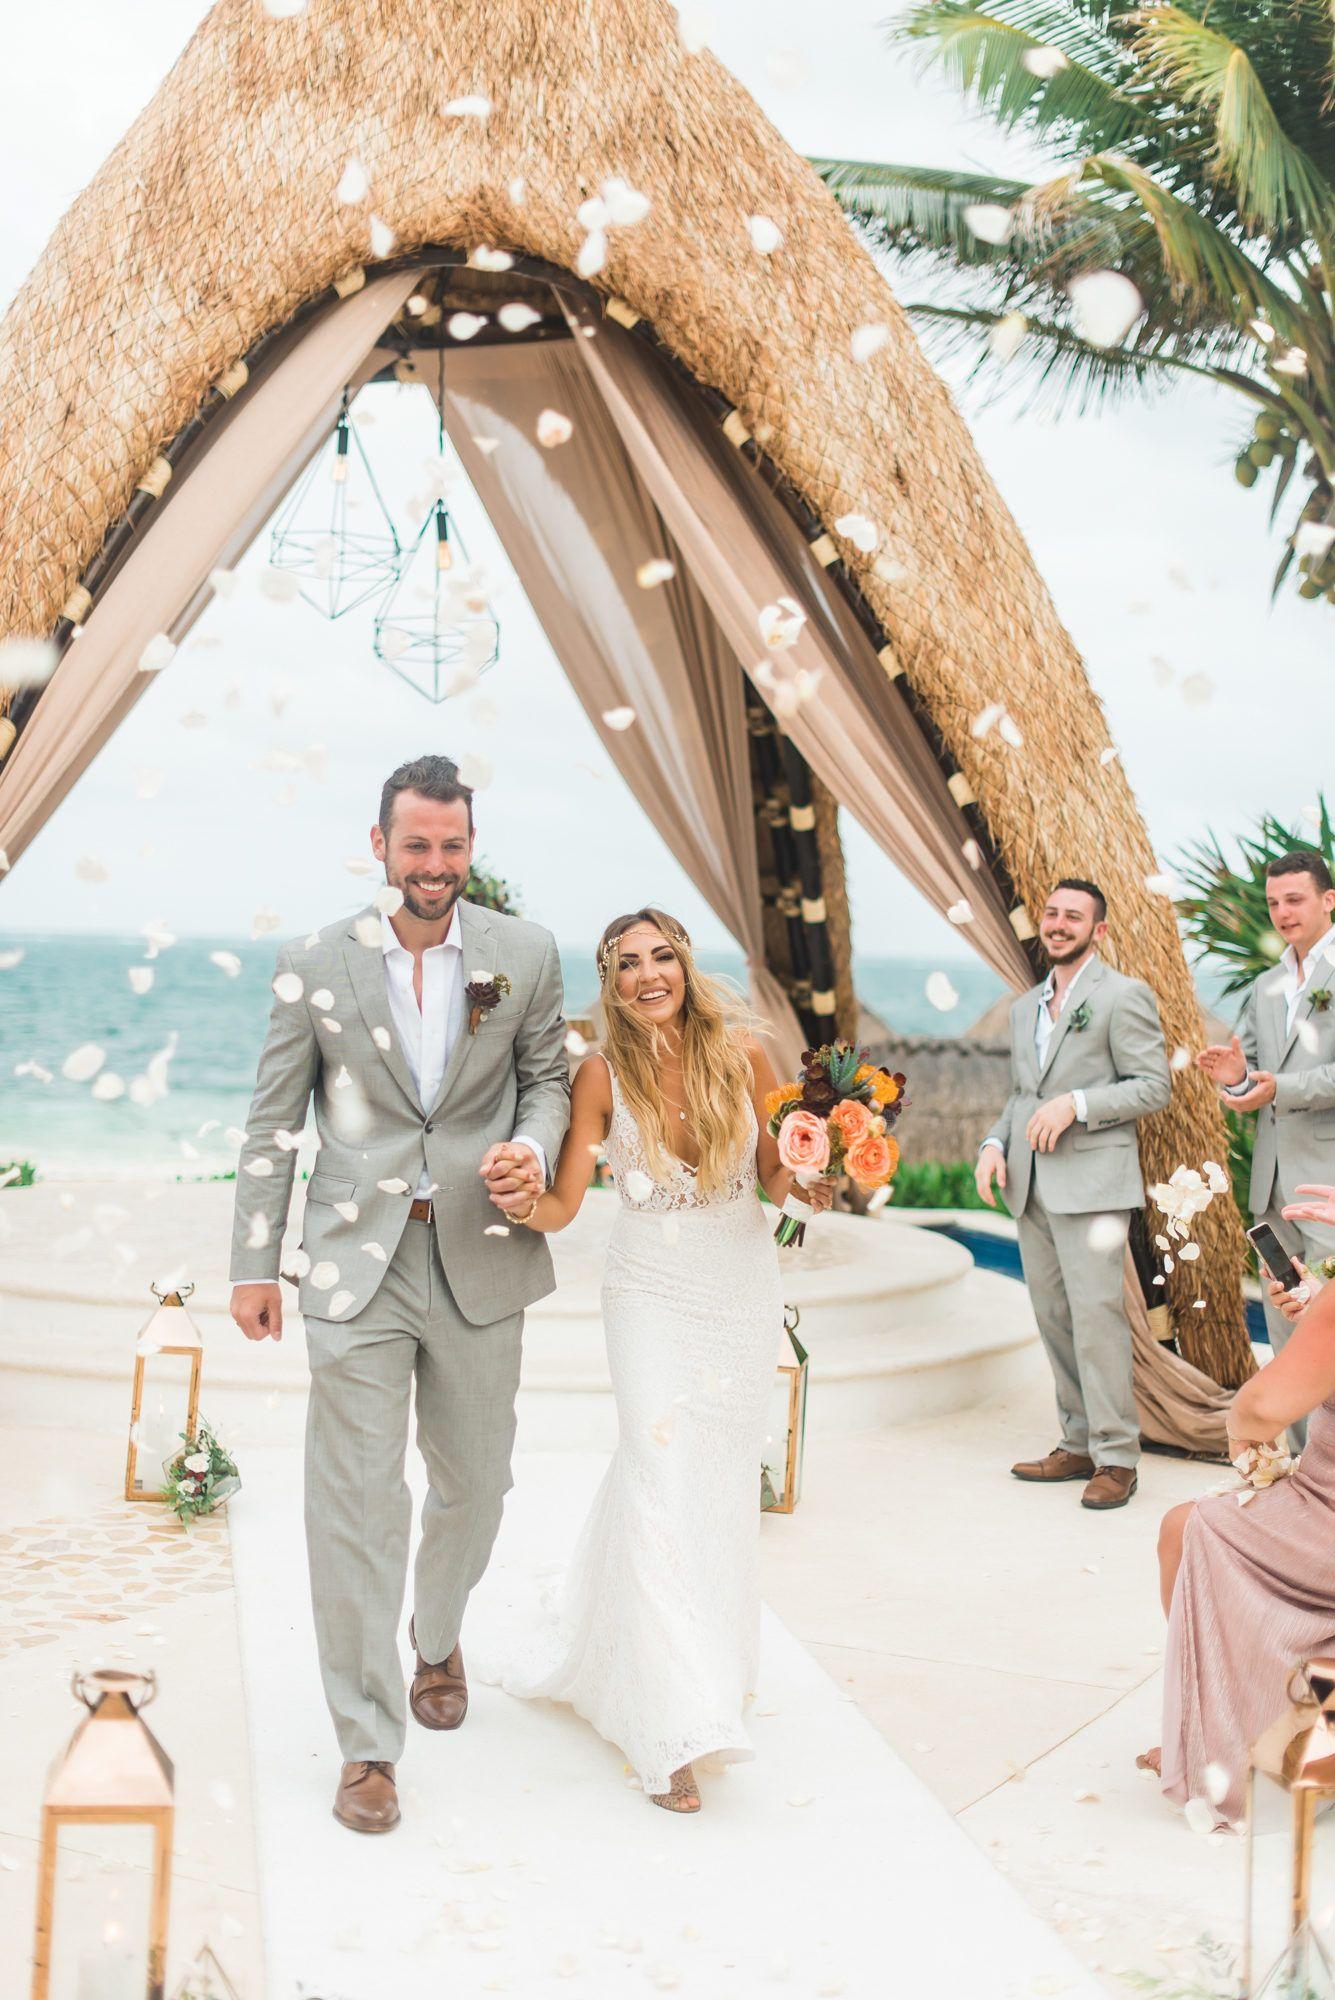 df55c9e5b0 Dreamy boho Mexico Wedding Bohemian Beach Wedding, Beach Wedding  Inspiration, Bohemian Weddings, Cancun